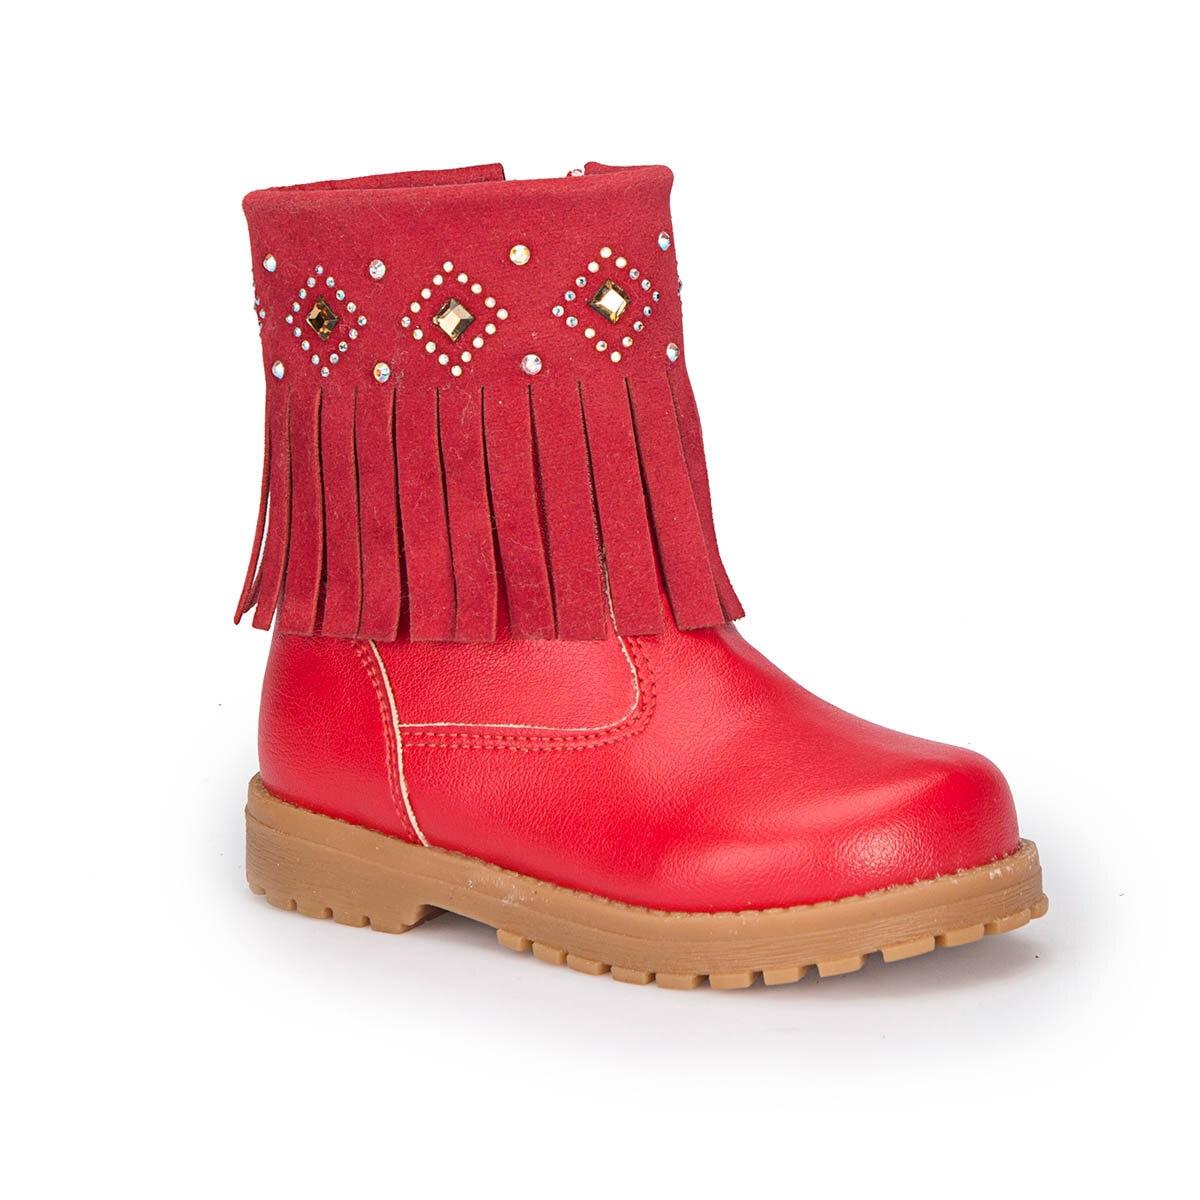 FLO 72. 509536.B Red Female Child Boots Polaris